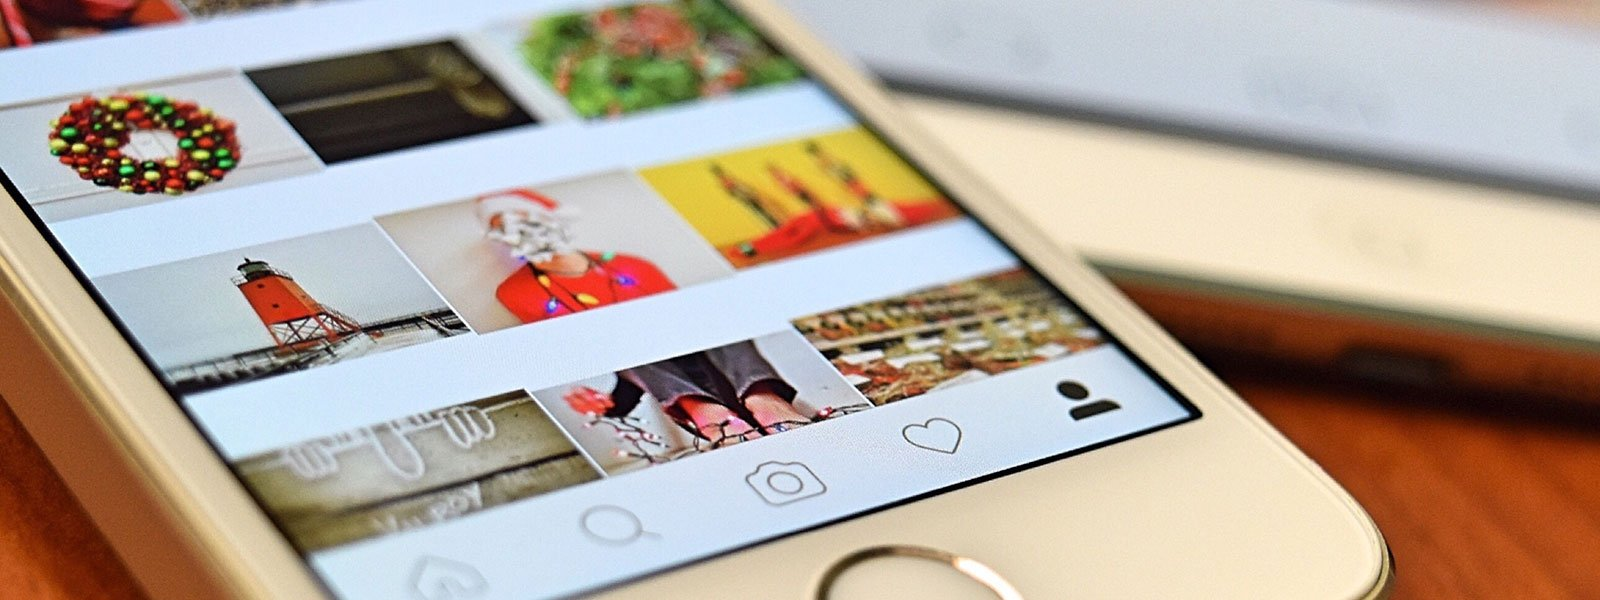 Proven Instagram engagement tips for 2019